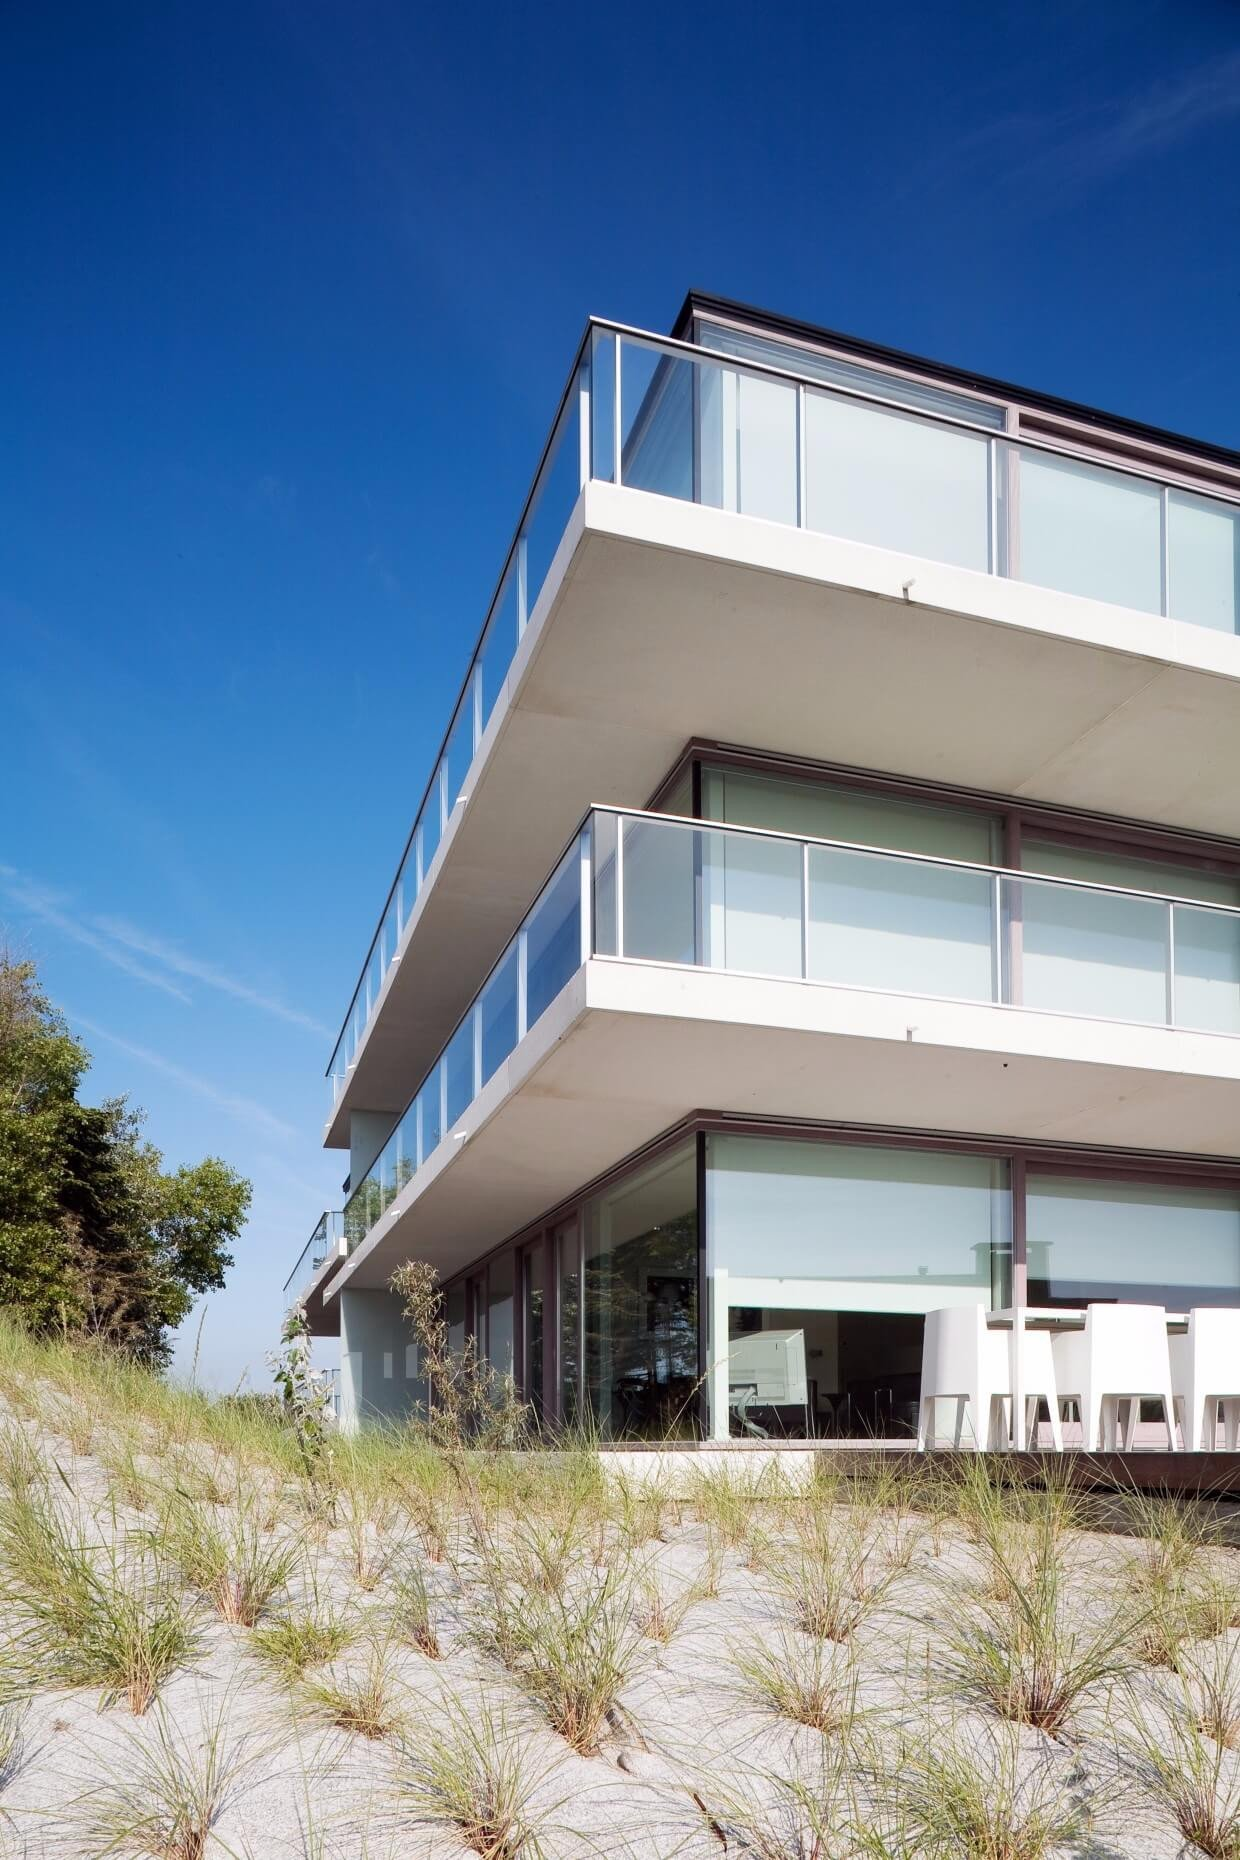 Rietveldprojects-Periscoop-appartement-design-architectuur-kust17.jpg